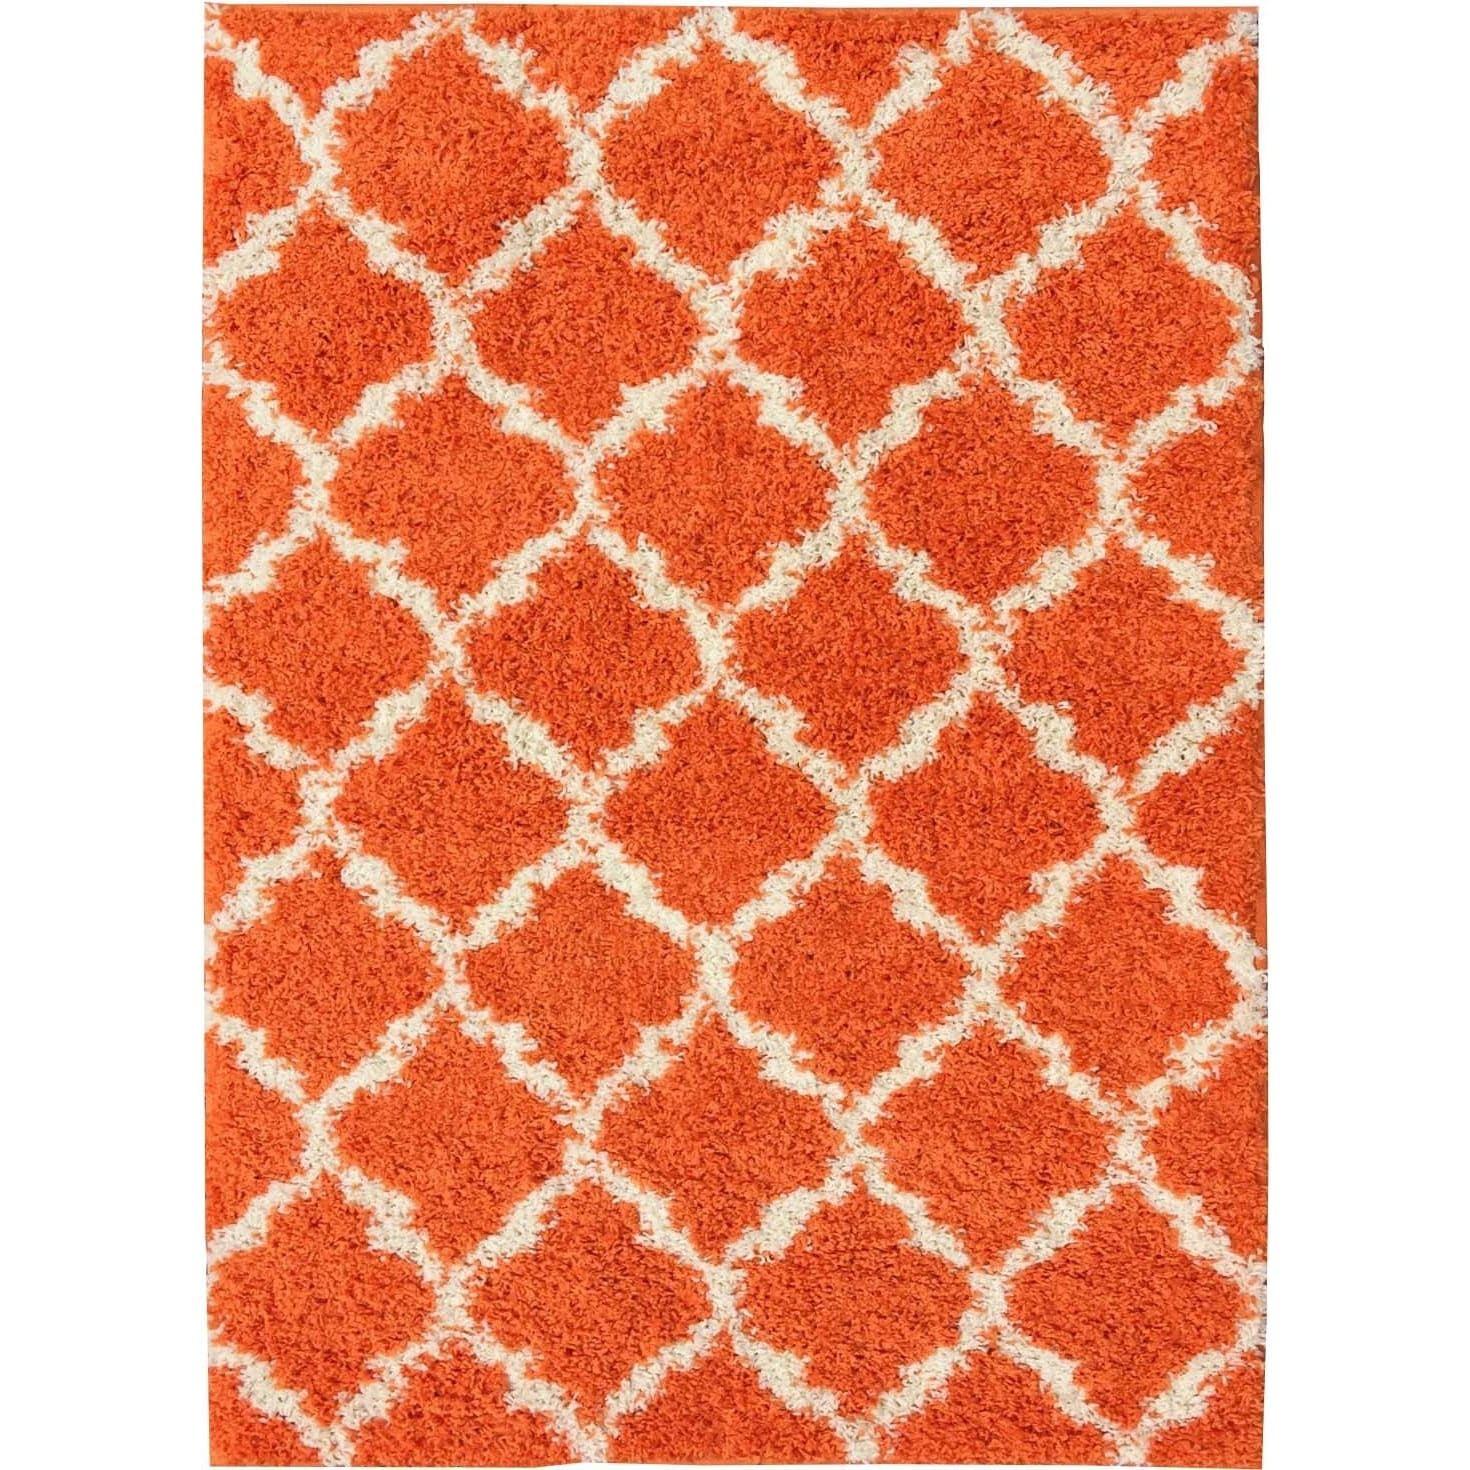 Orange Shag Area Rug Rugs Ideas